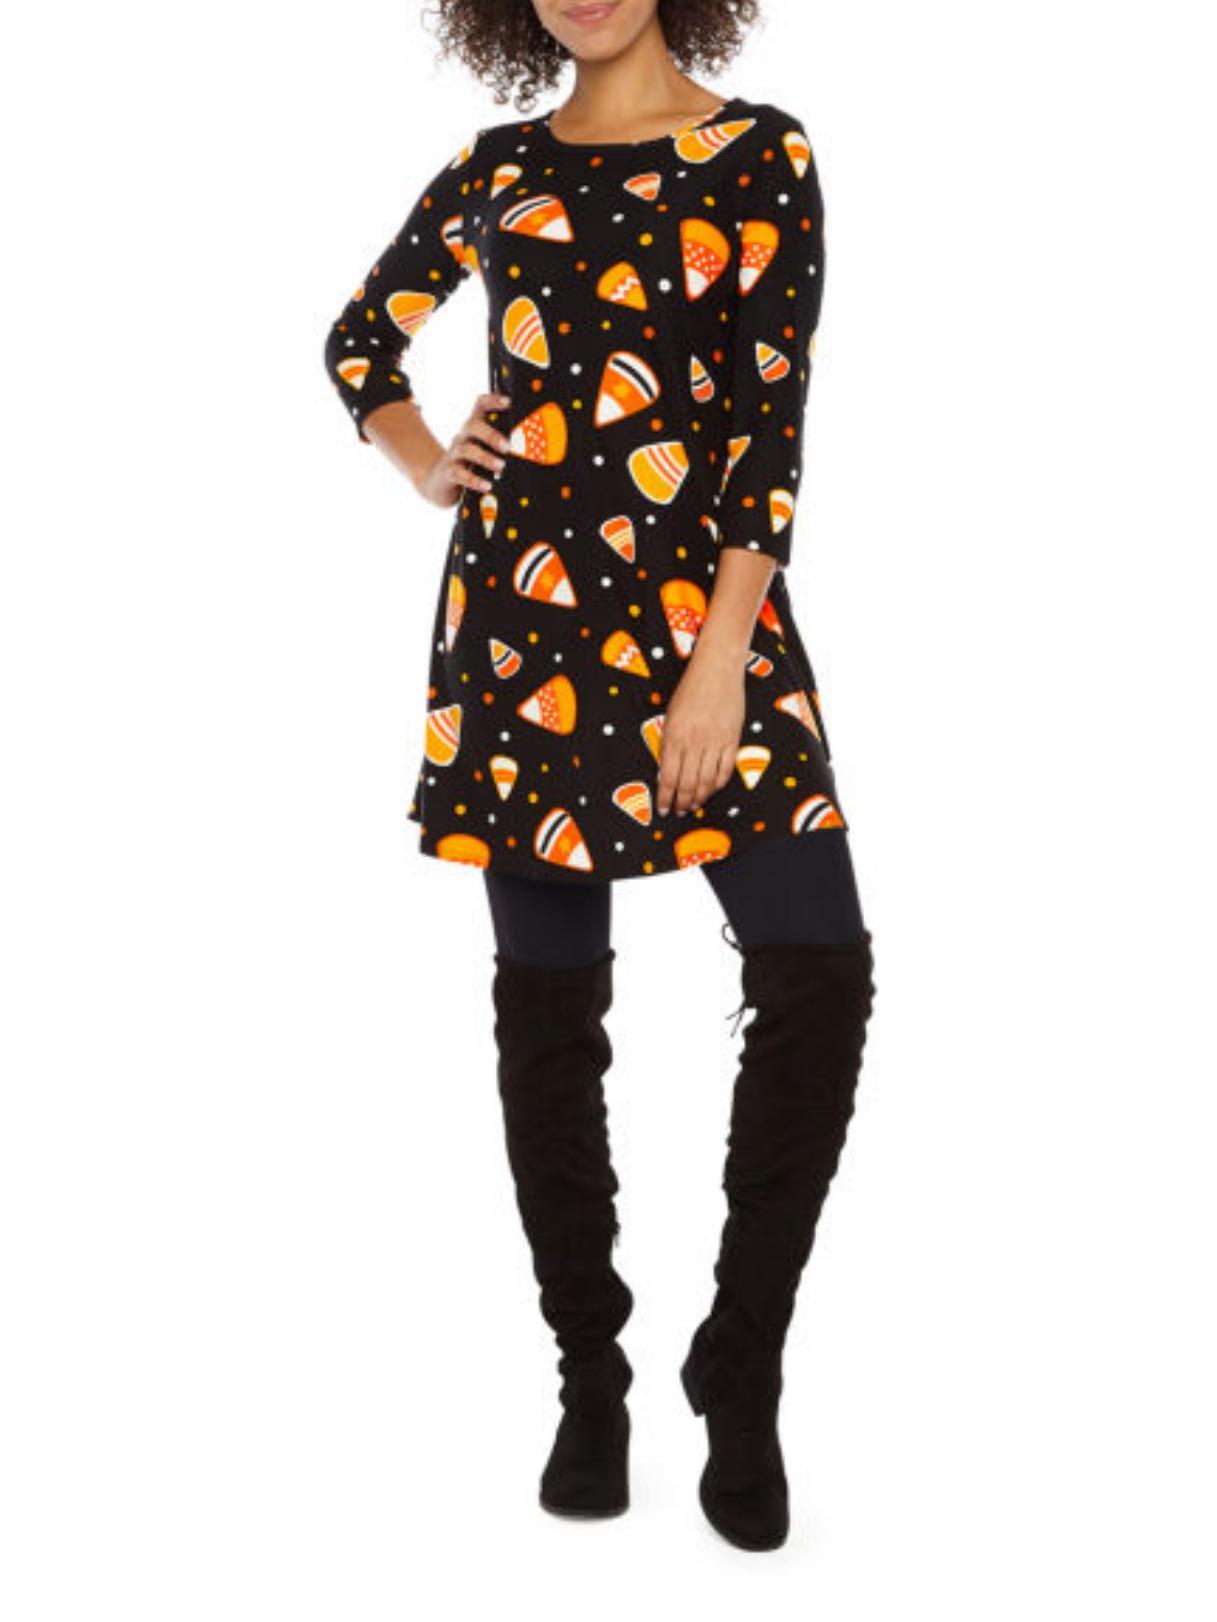 St. John's Bay 3/4 Sleeve Halloween Swing Dress - Black Candy Corn